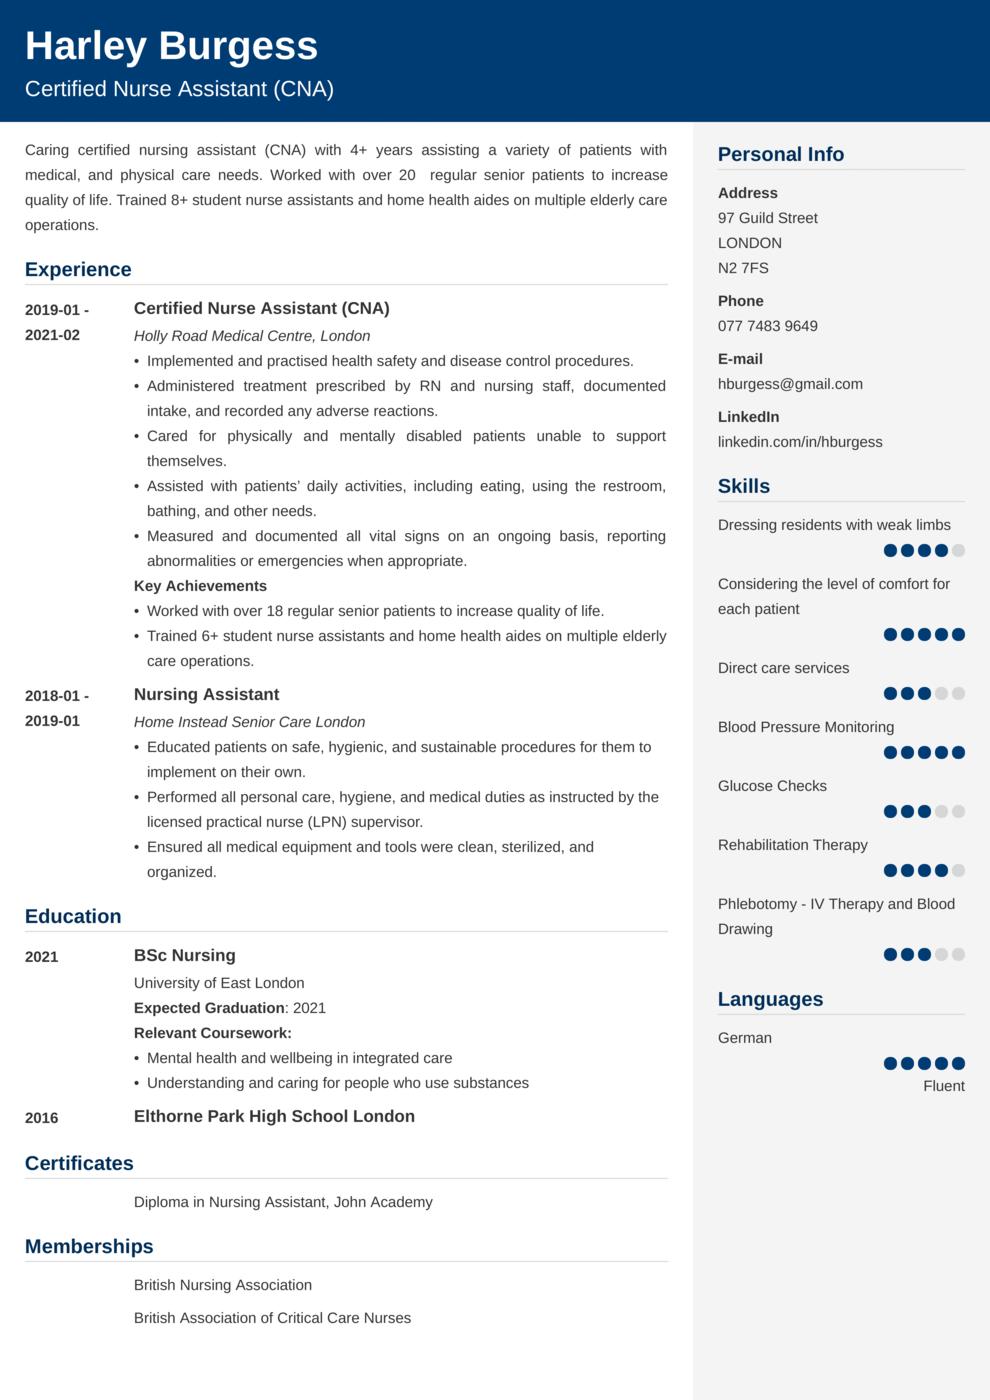 Certified Nurse Assistant (CNA) CV Example